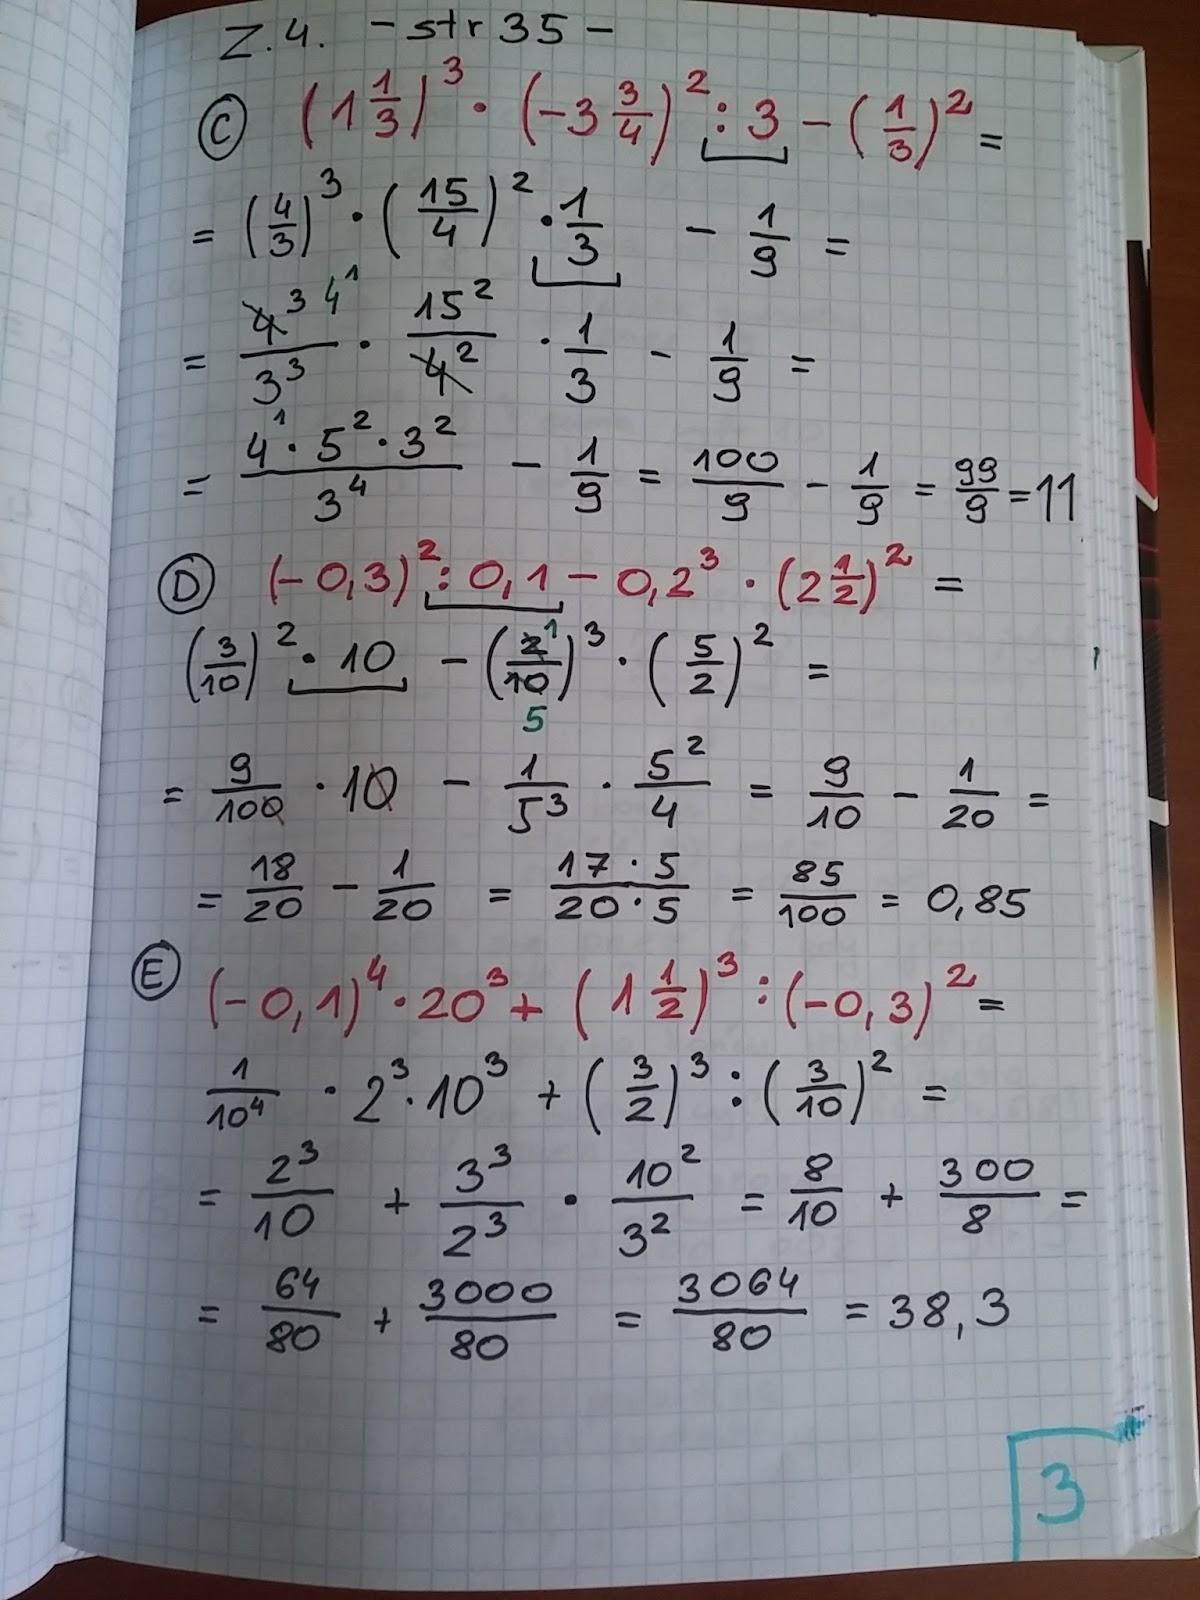 wsip podręcznik do matematyki klasa 7